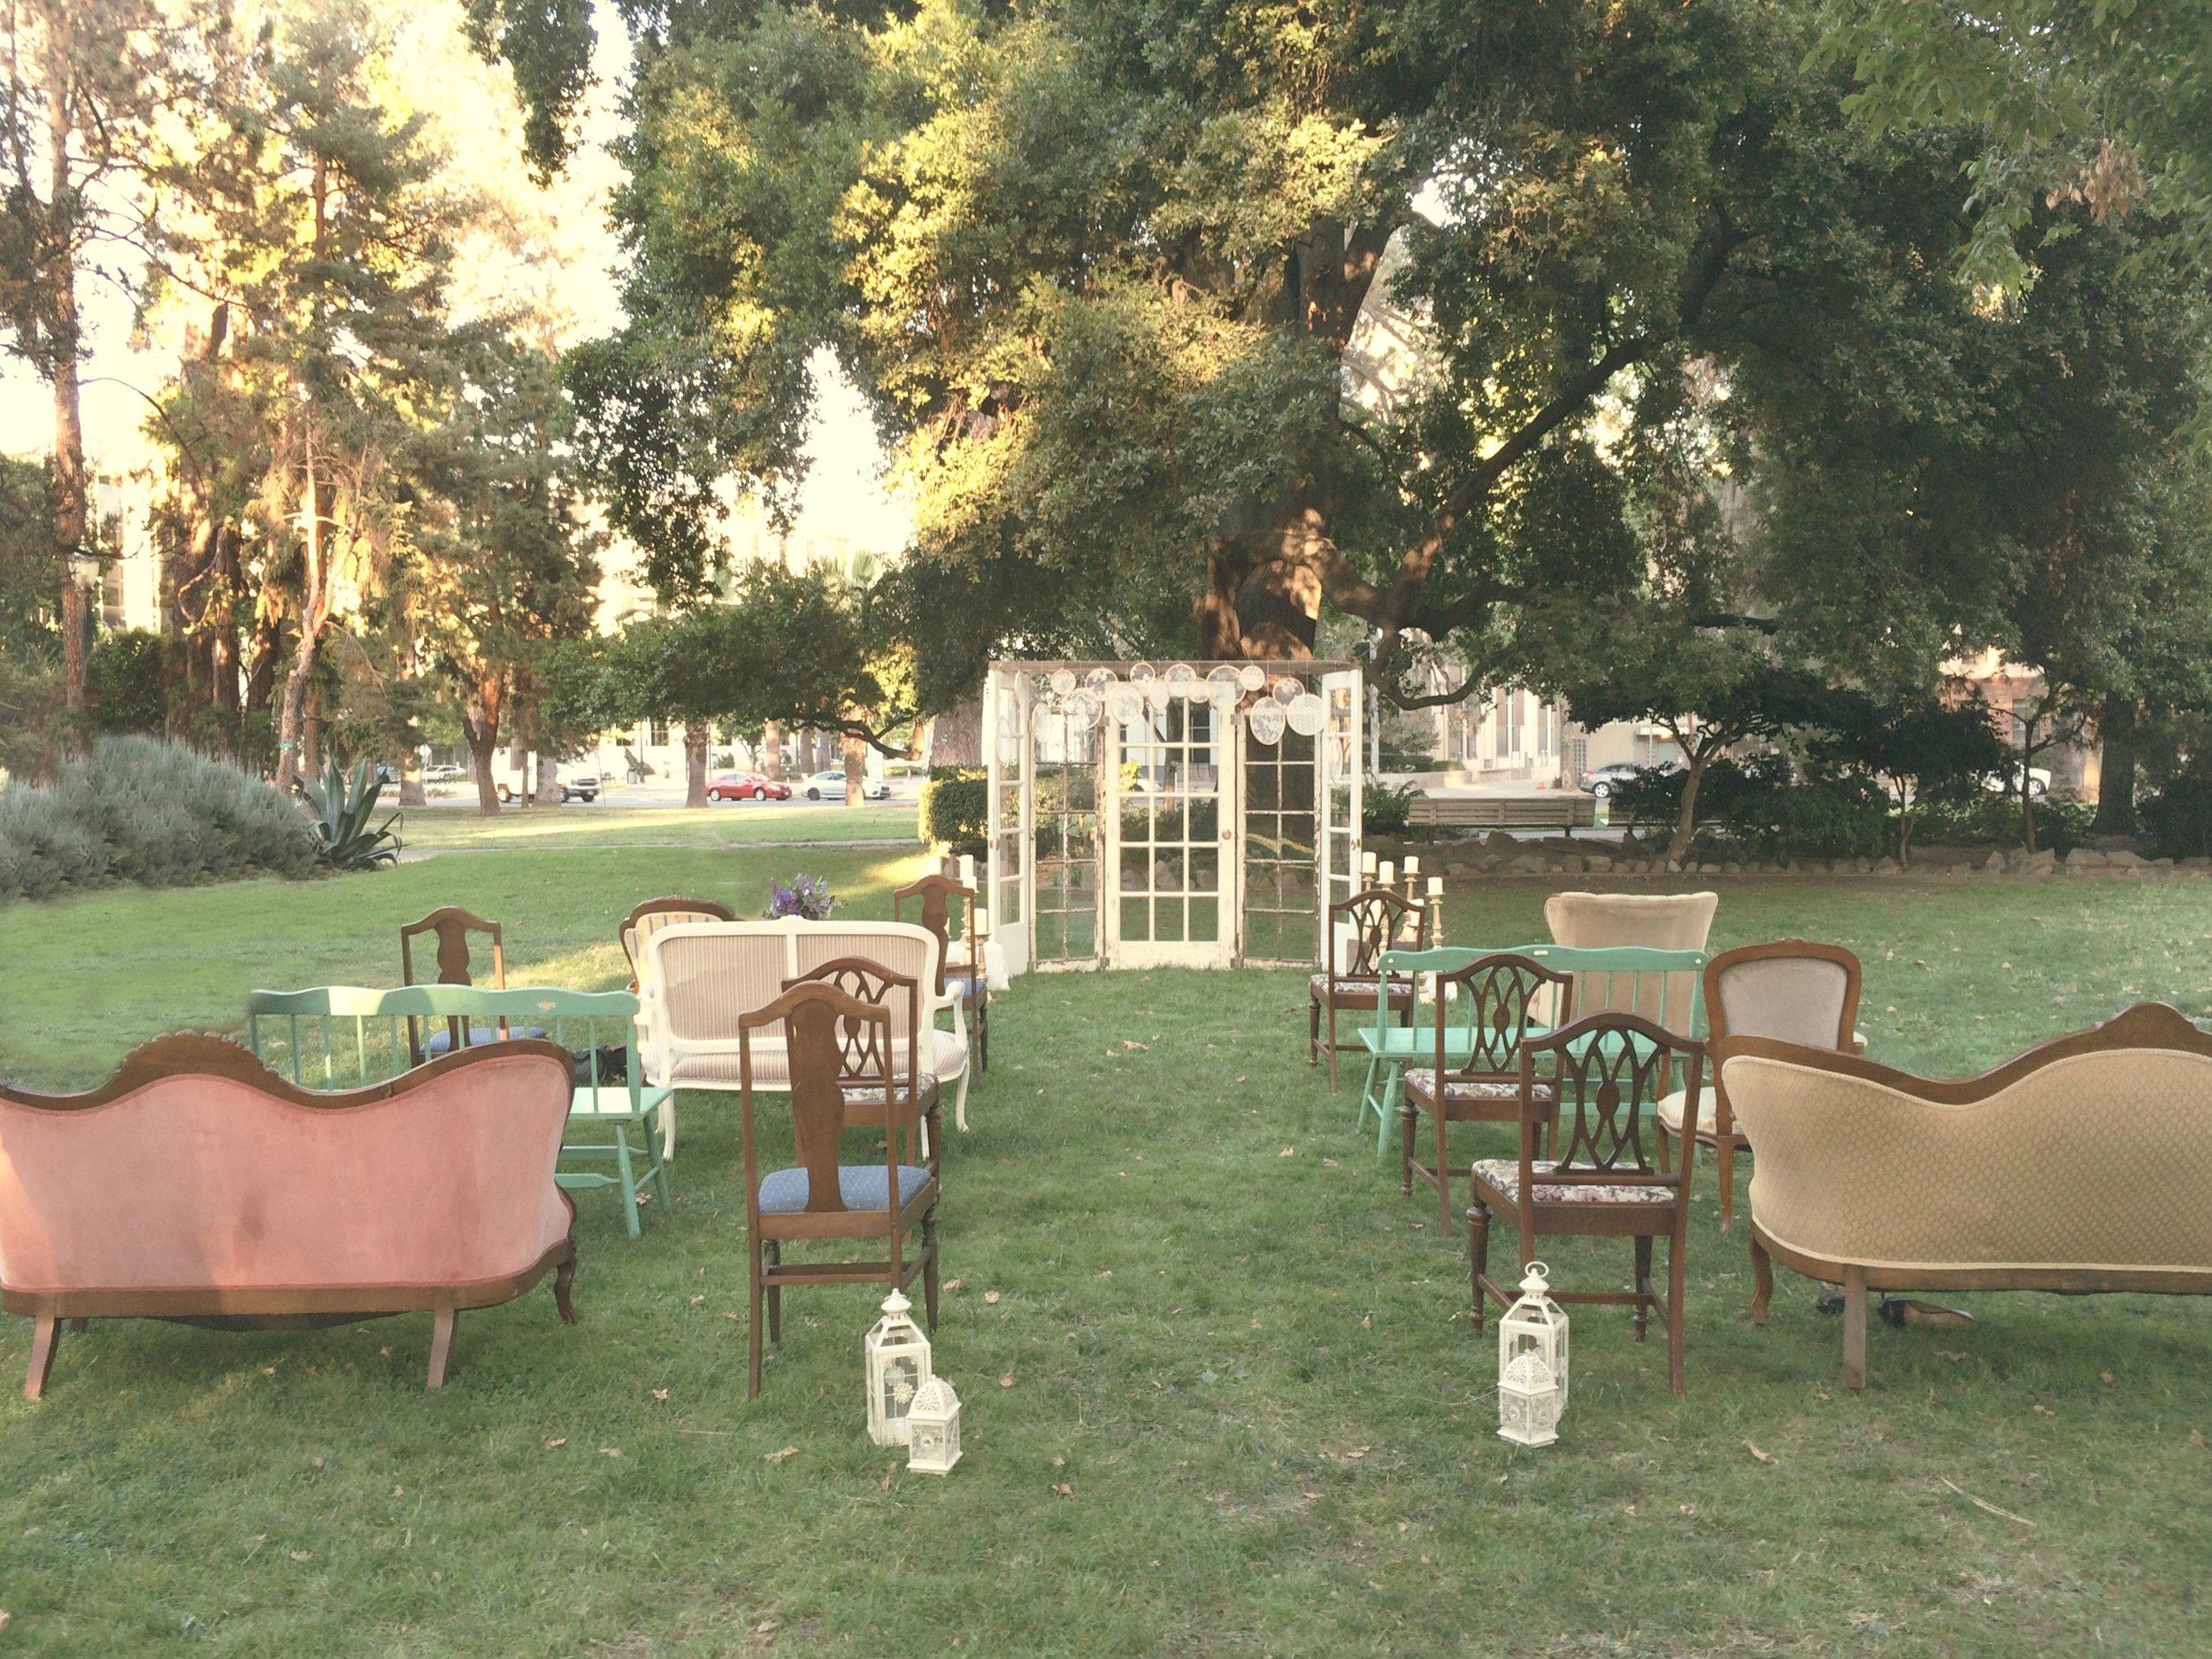 Boho Style Wedding Ceremony in the park